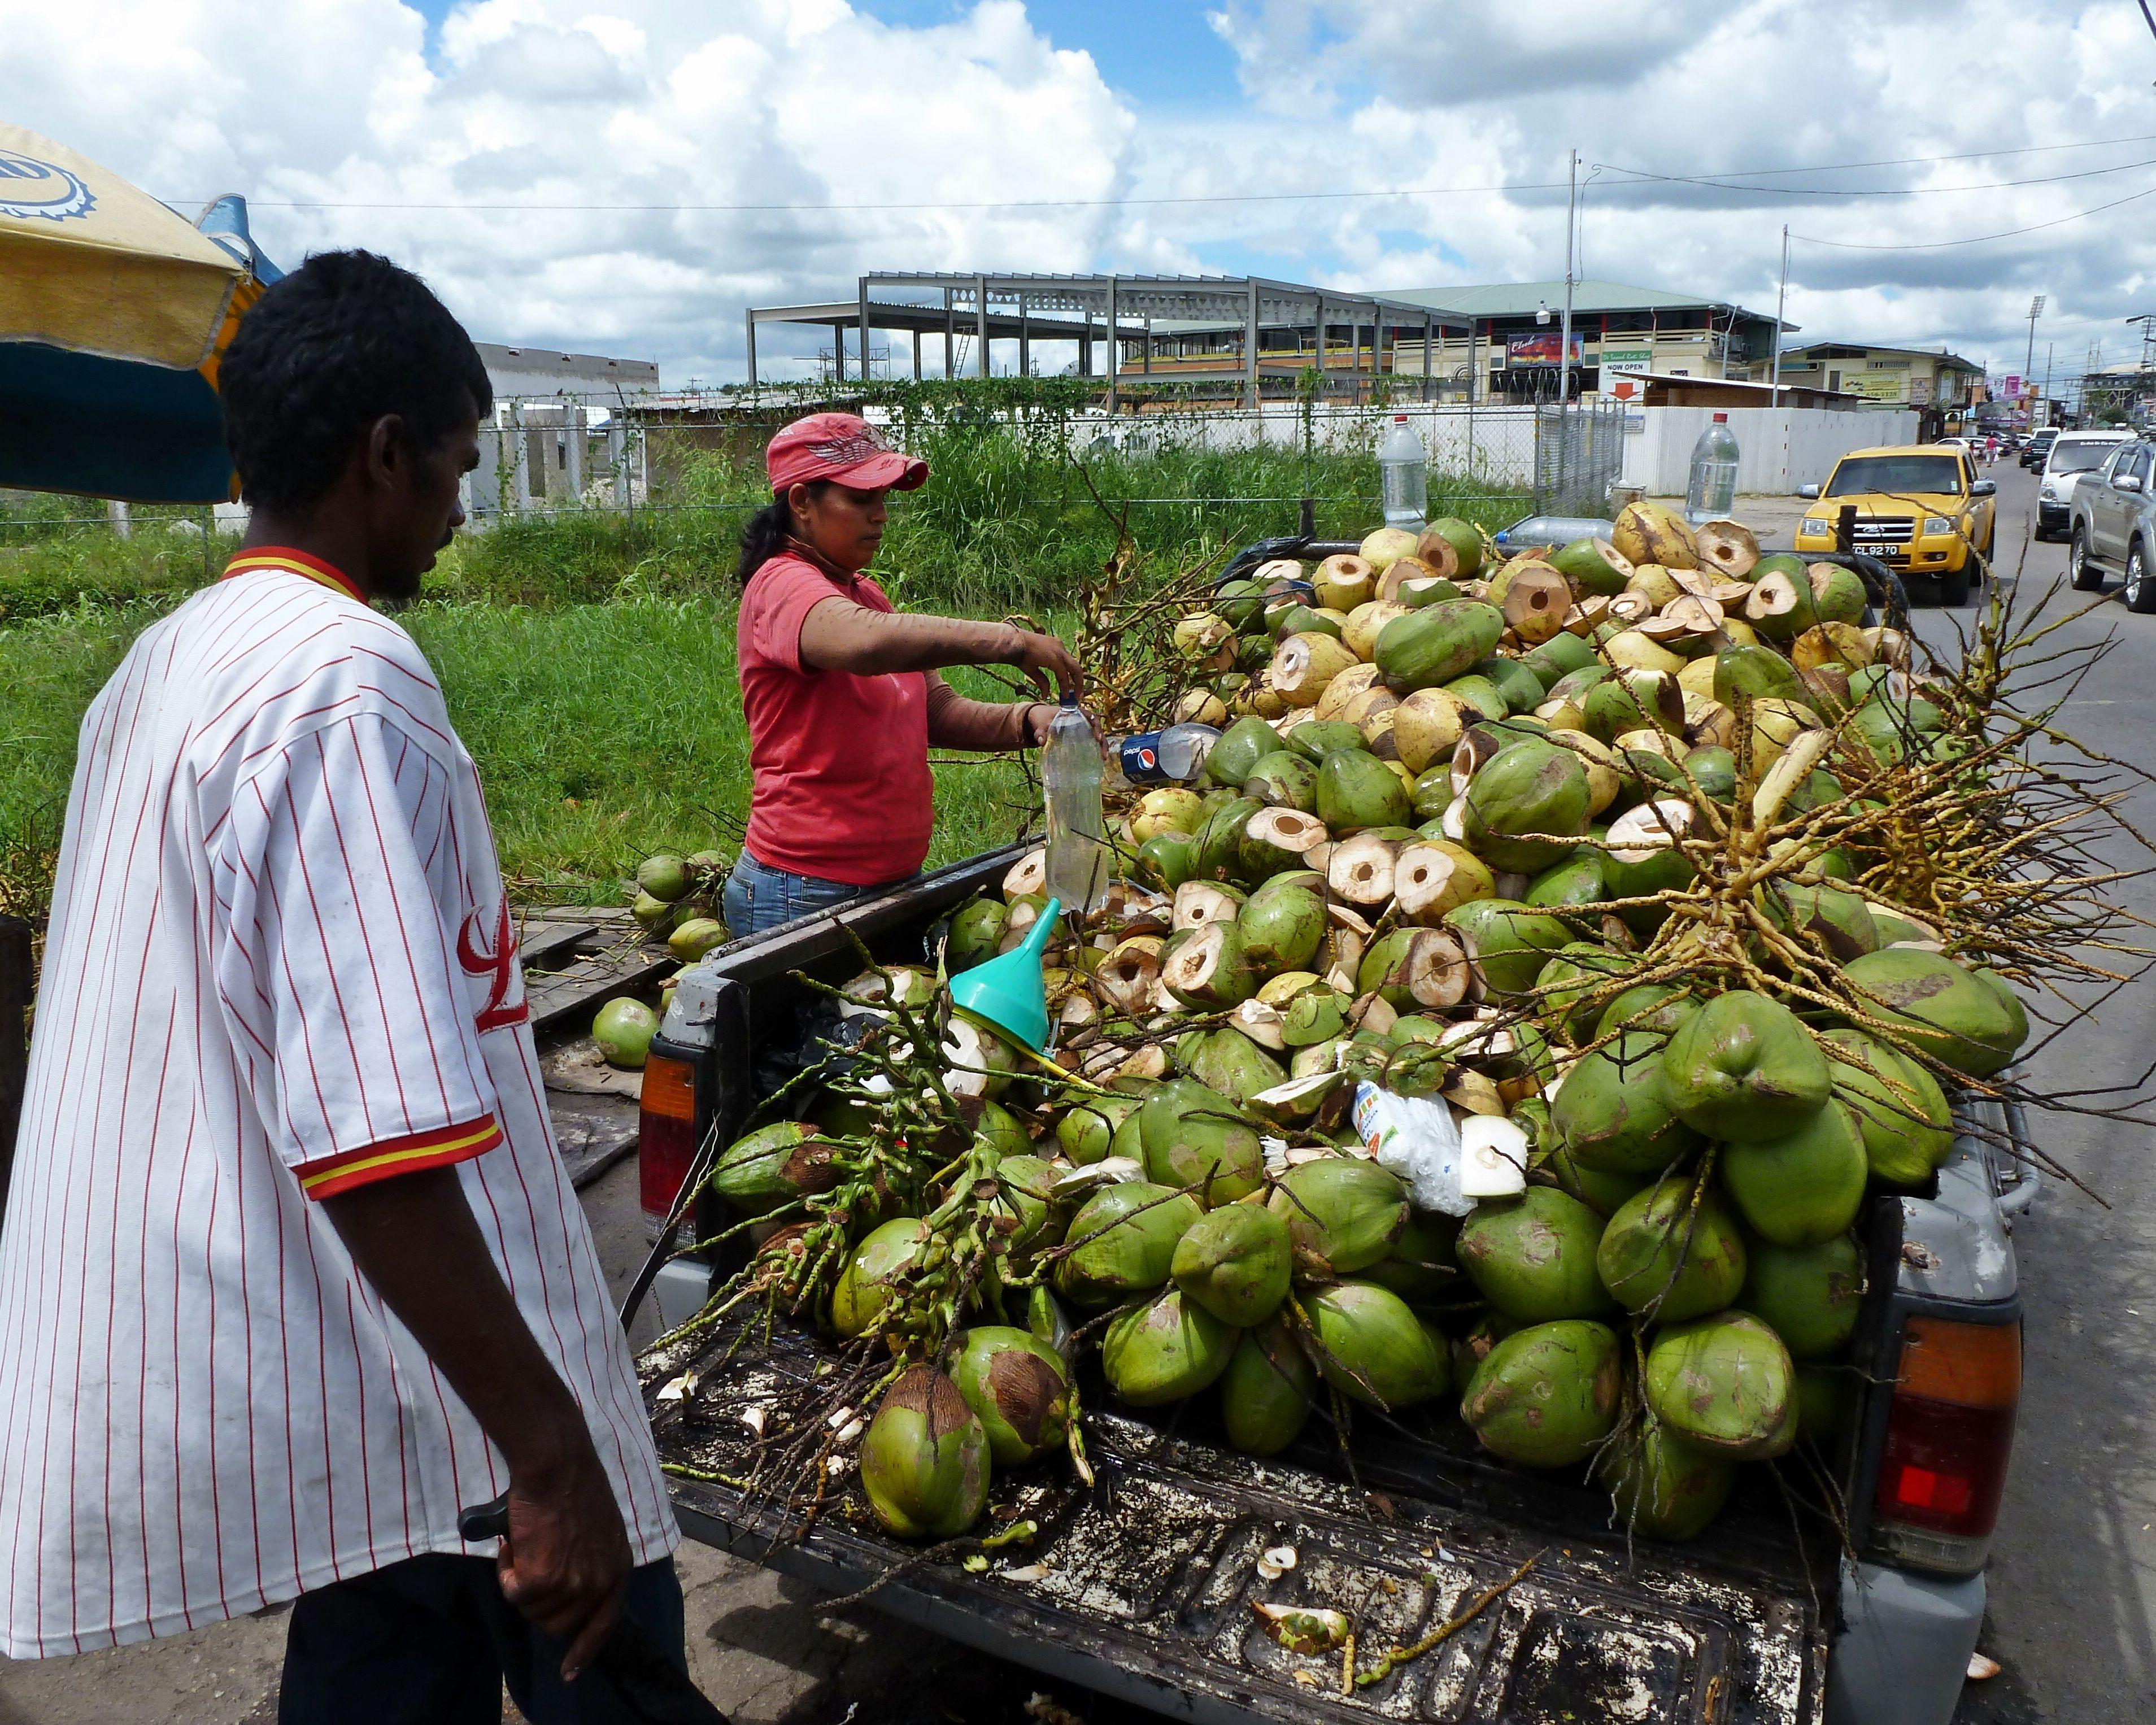 Mother Nature | Trinidad culture, Caribbean art, African ... |Trinidad And Tobago Culture Islands